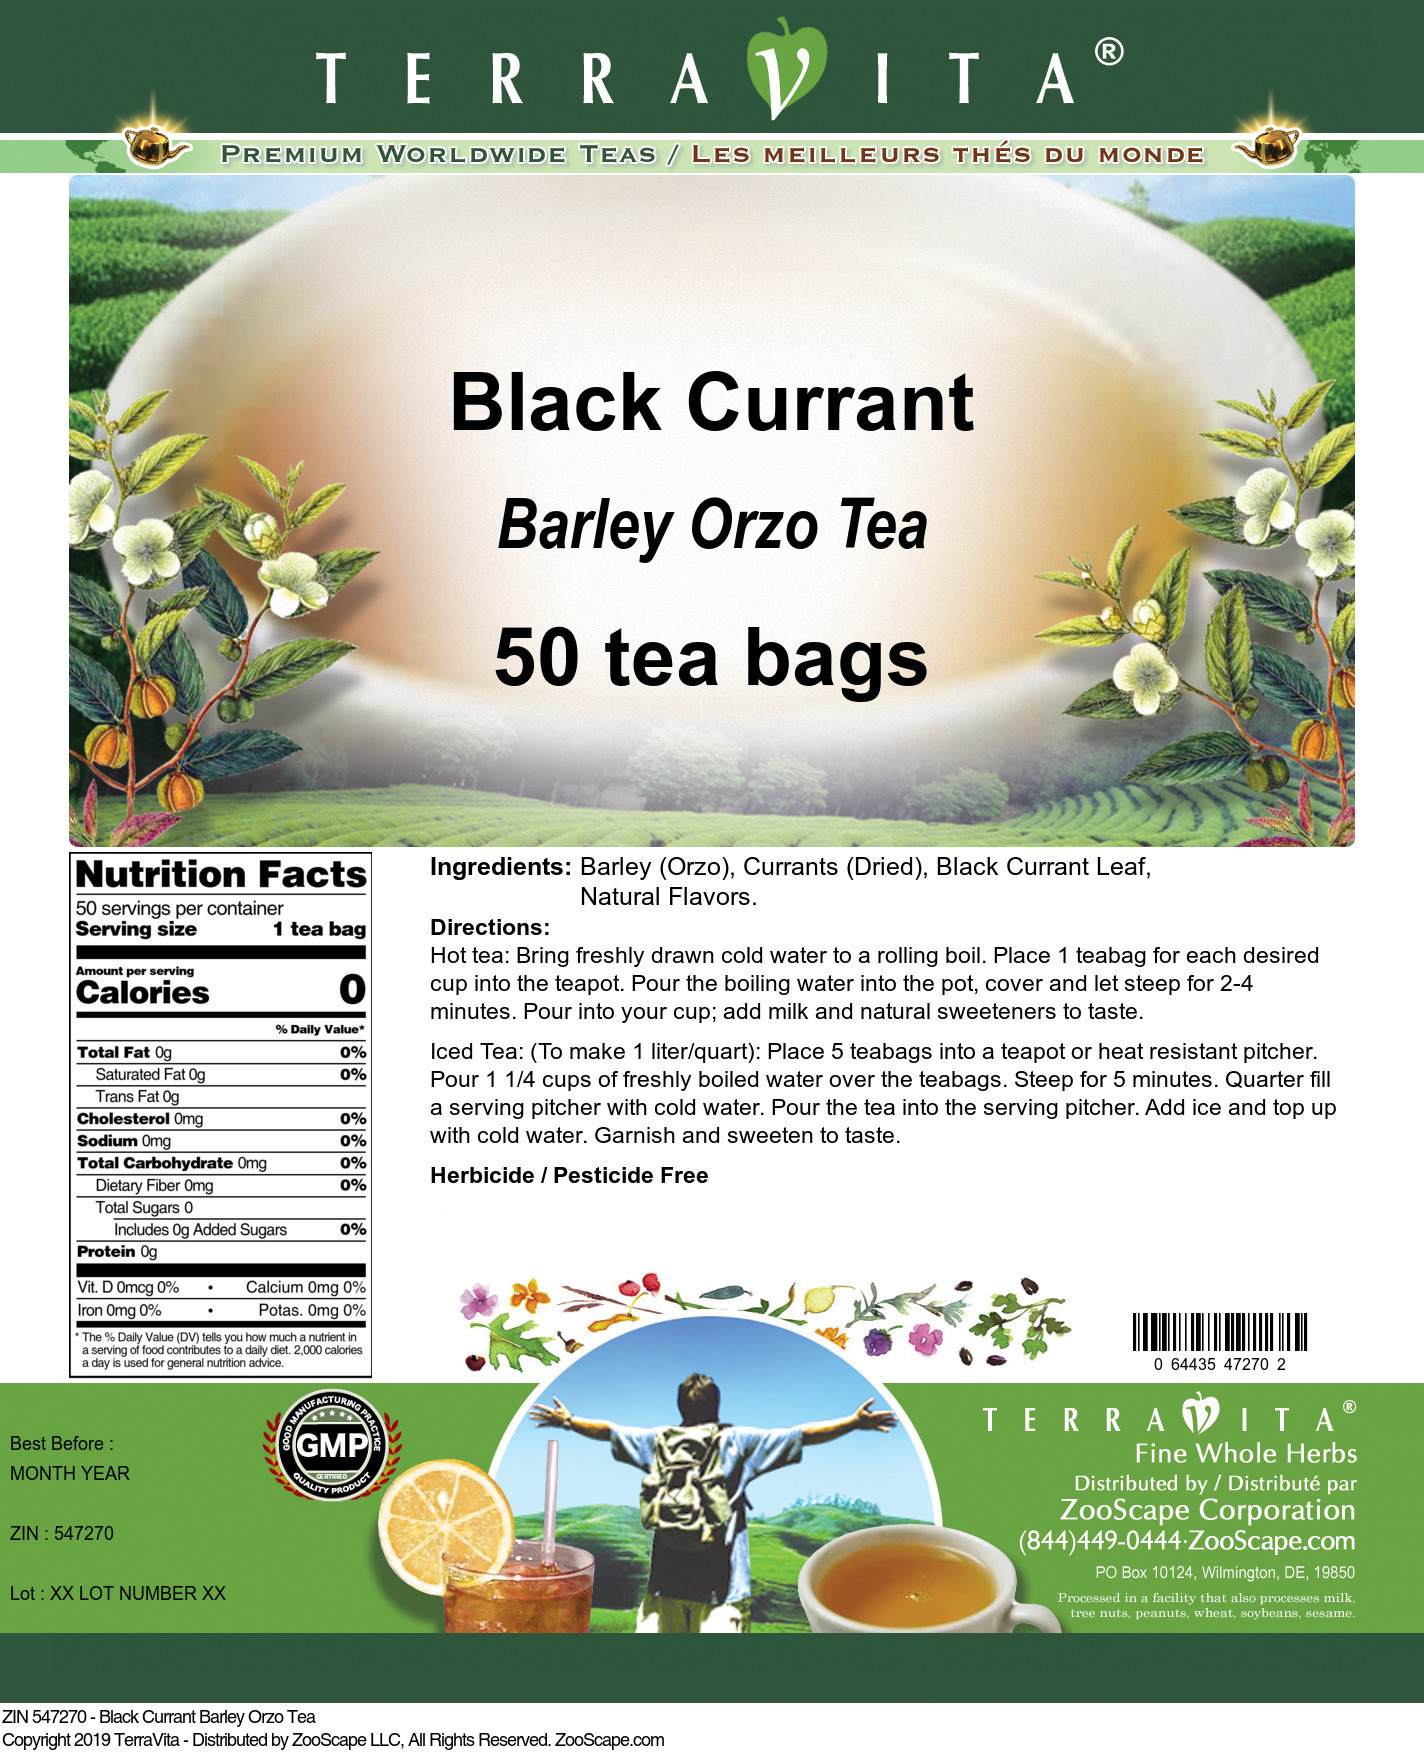 Black Currant Barley Orzo Tea